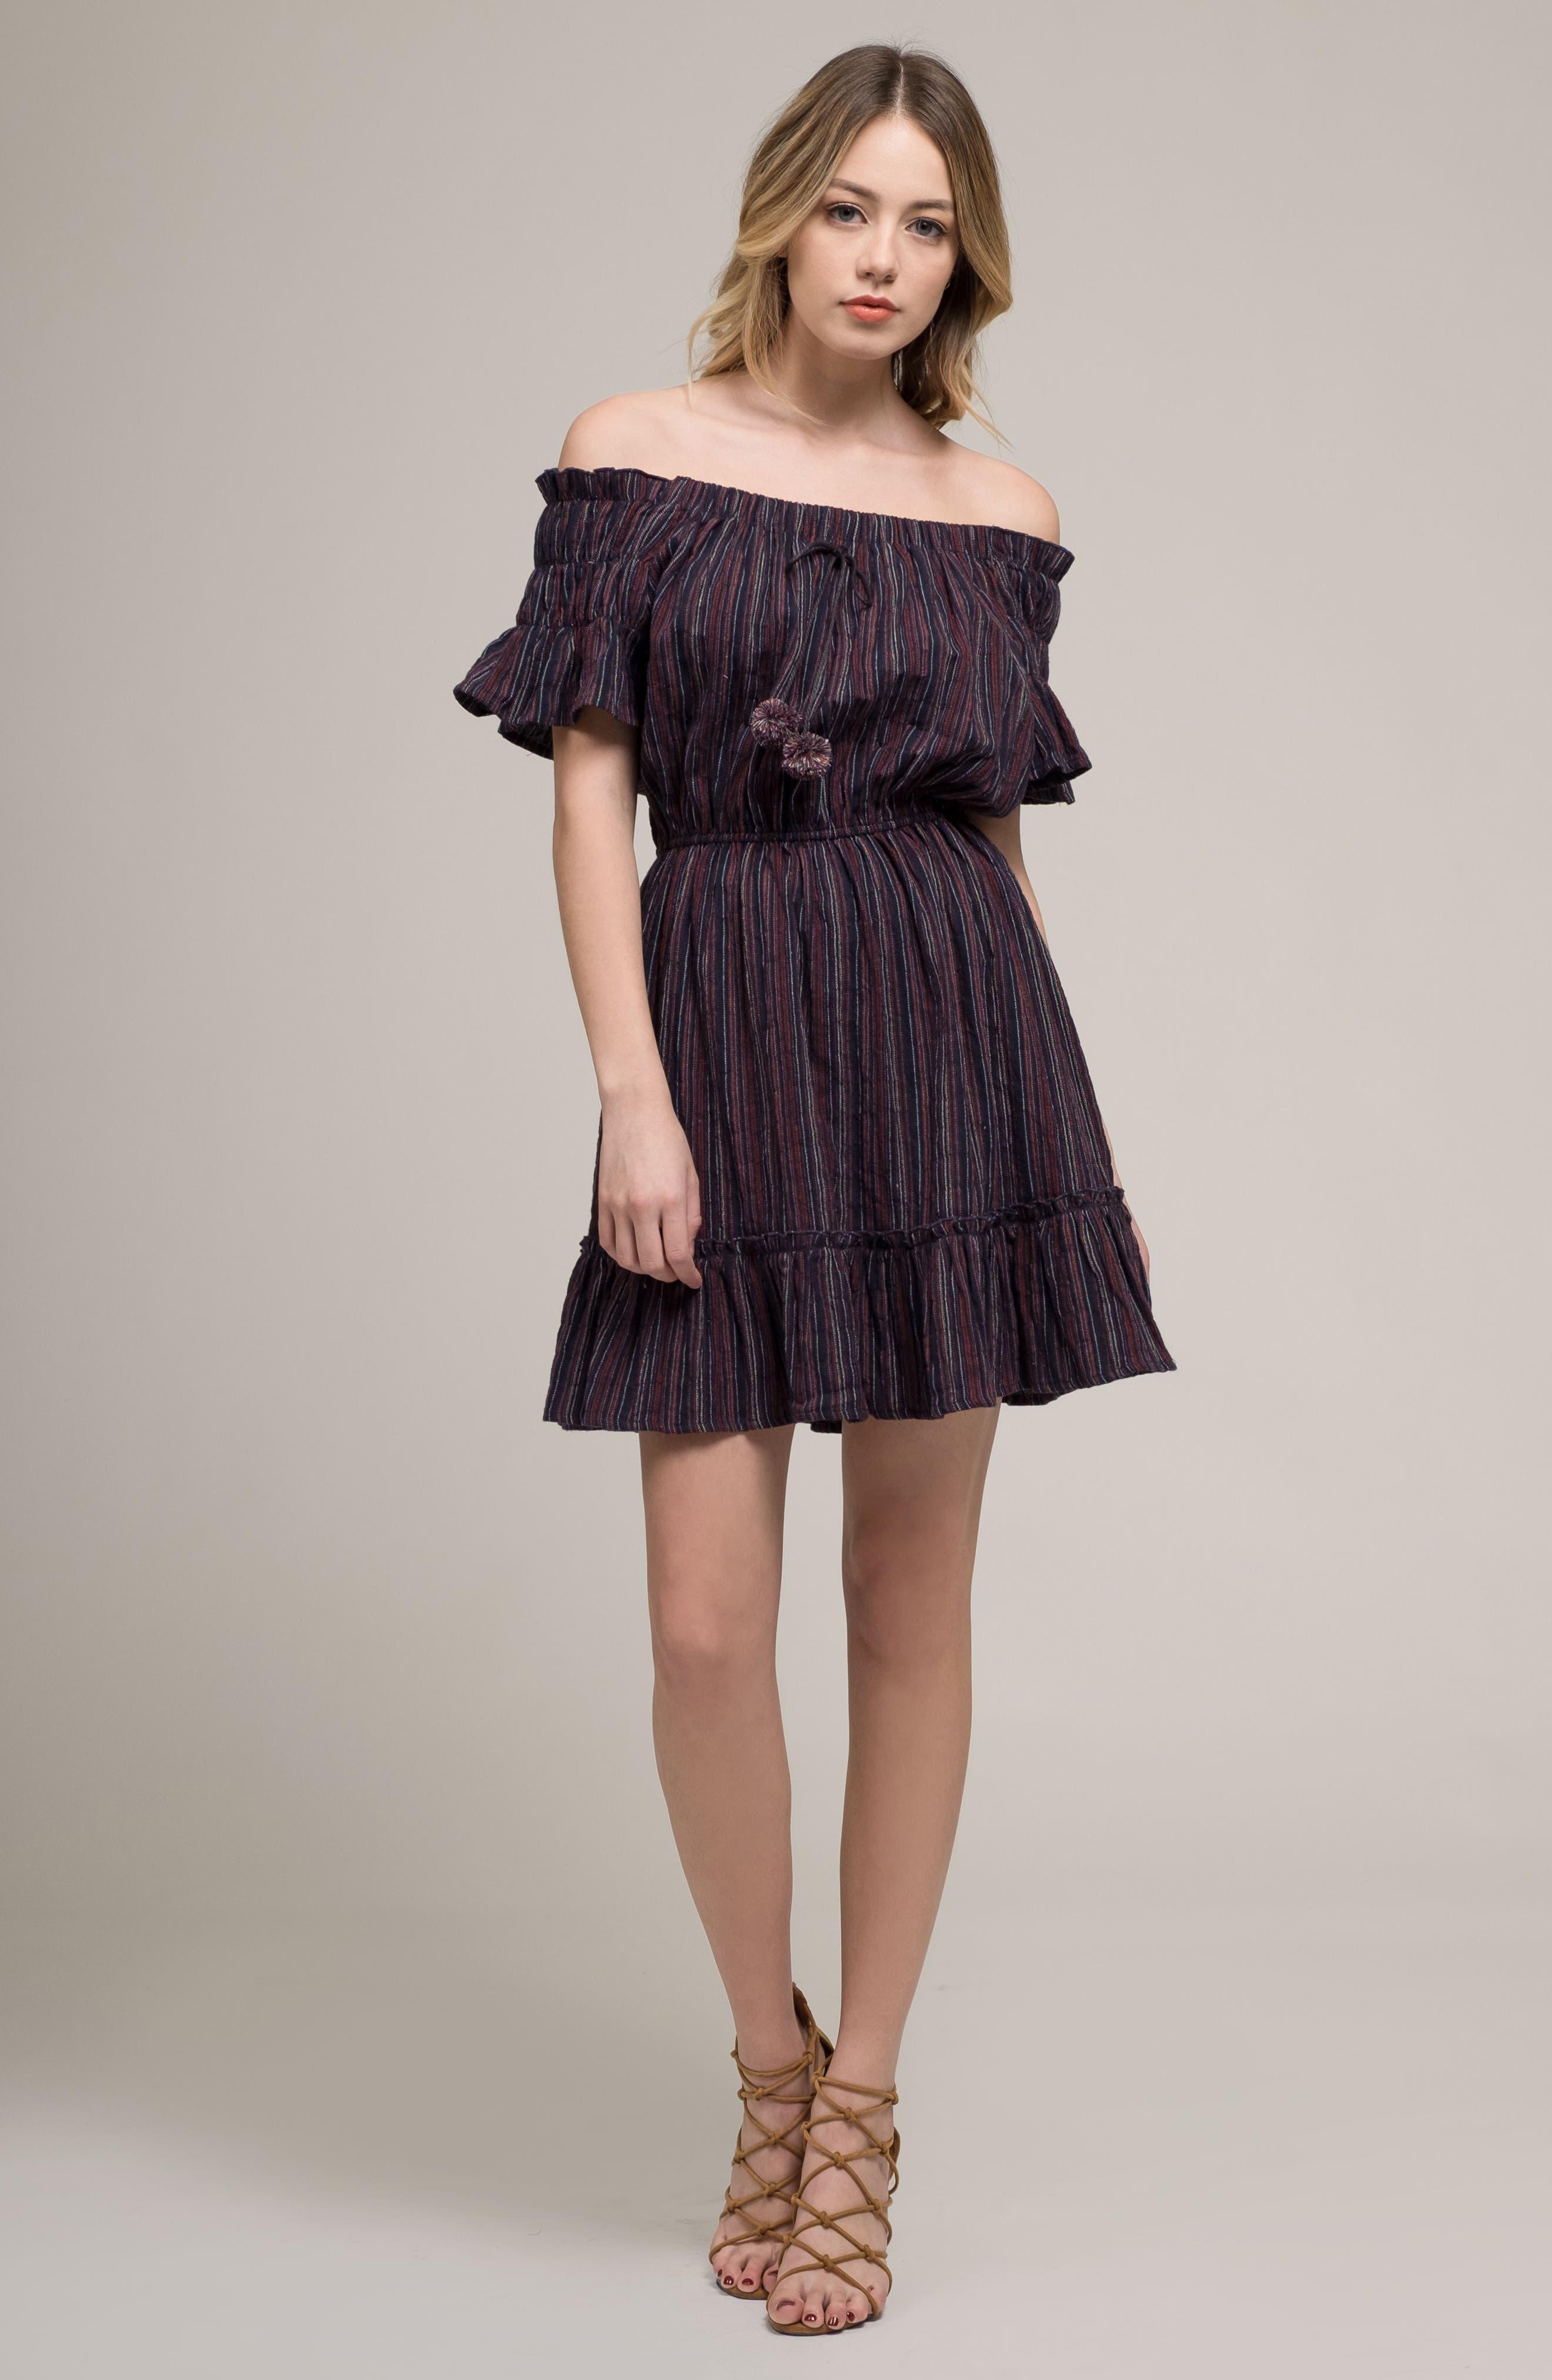 Stripe Off the Shoulder Dress,                             Alternate thumbnail 8, color,                             411